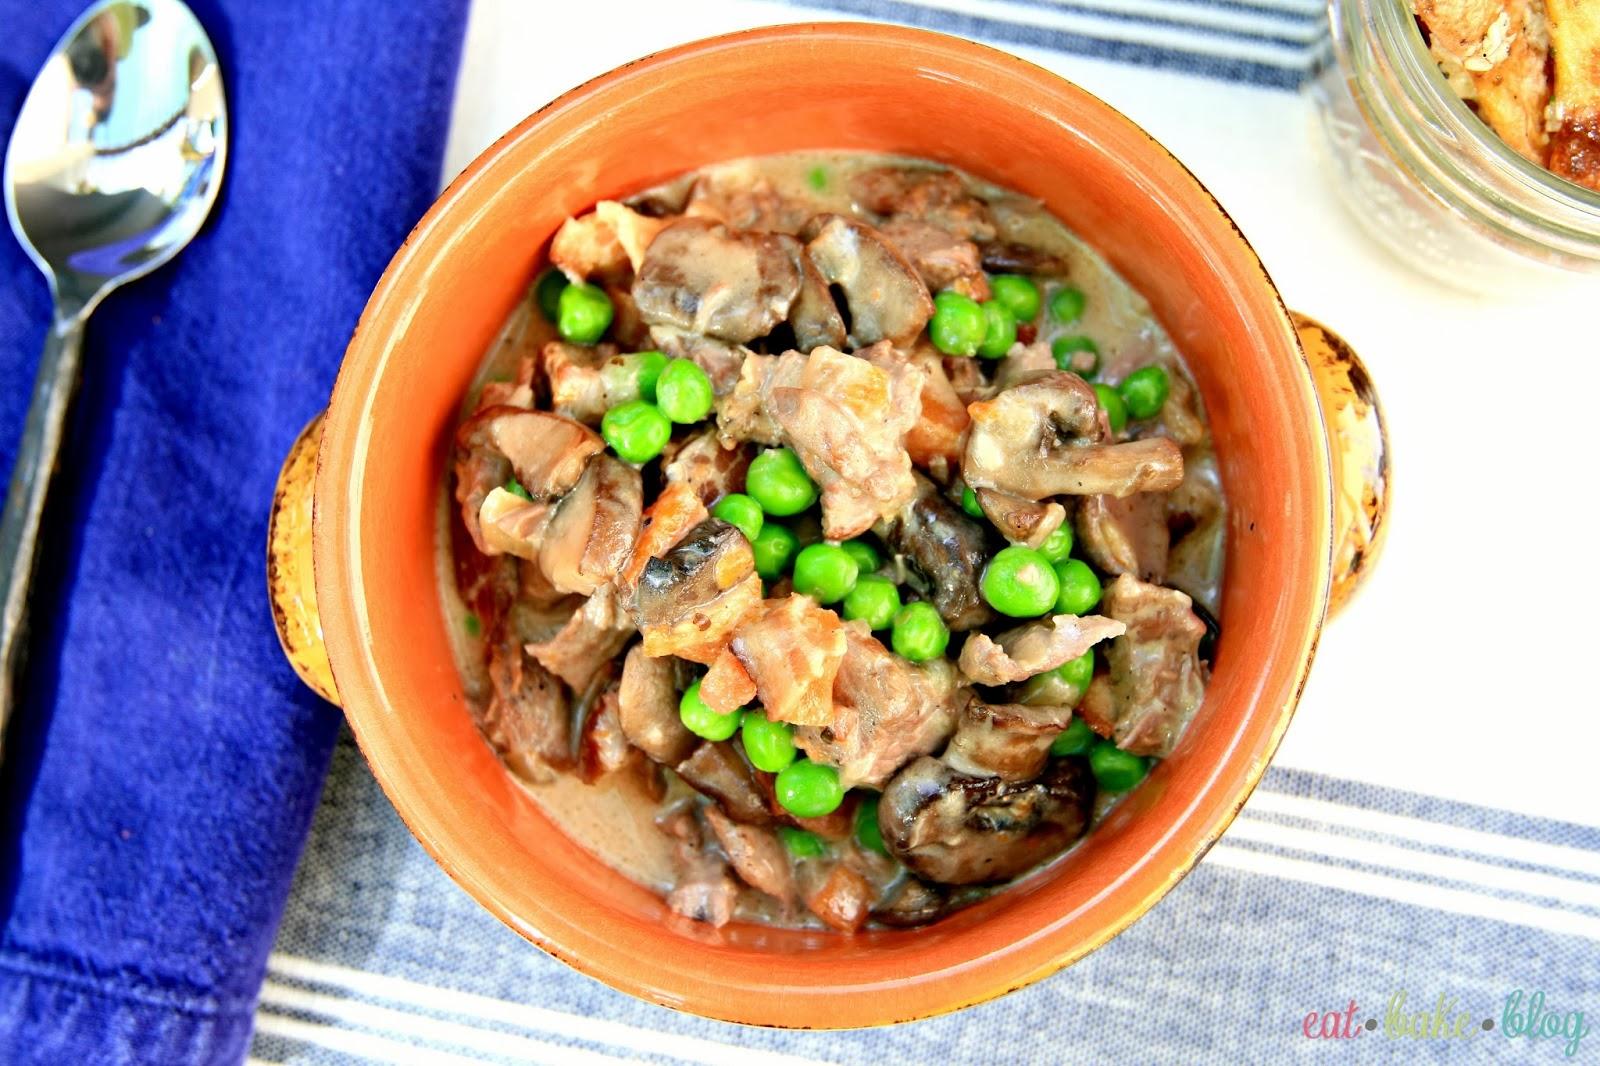 best lamb stew recipe easy beef stew recipe easy entertaining fingerling potato recipe best roasted potatoes